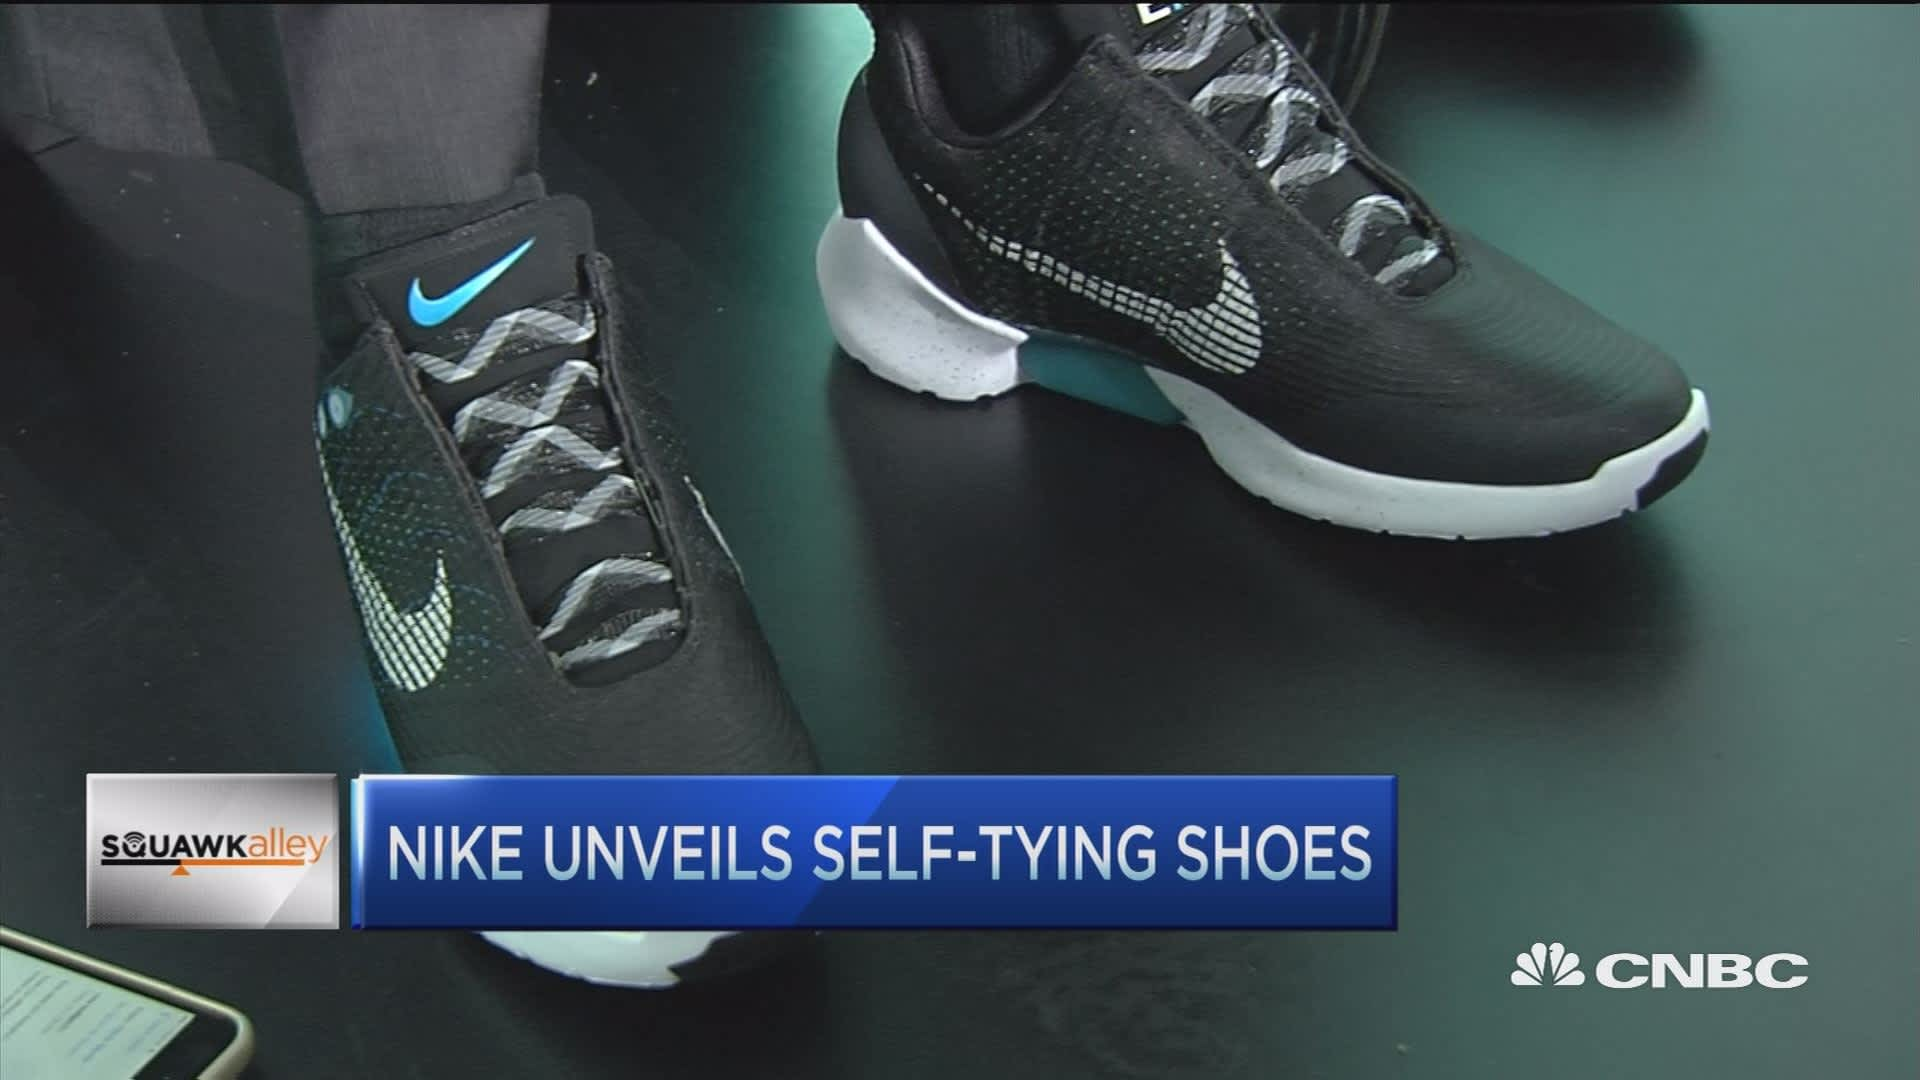 Nike designer Self,tying shoes a big step forward